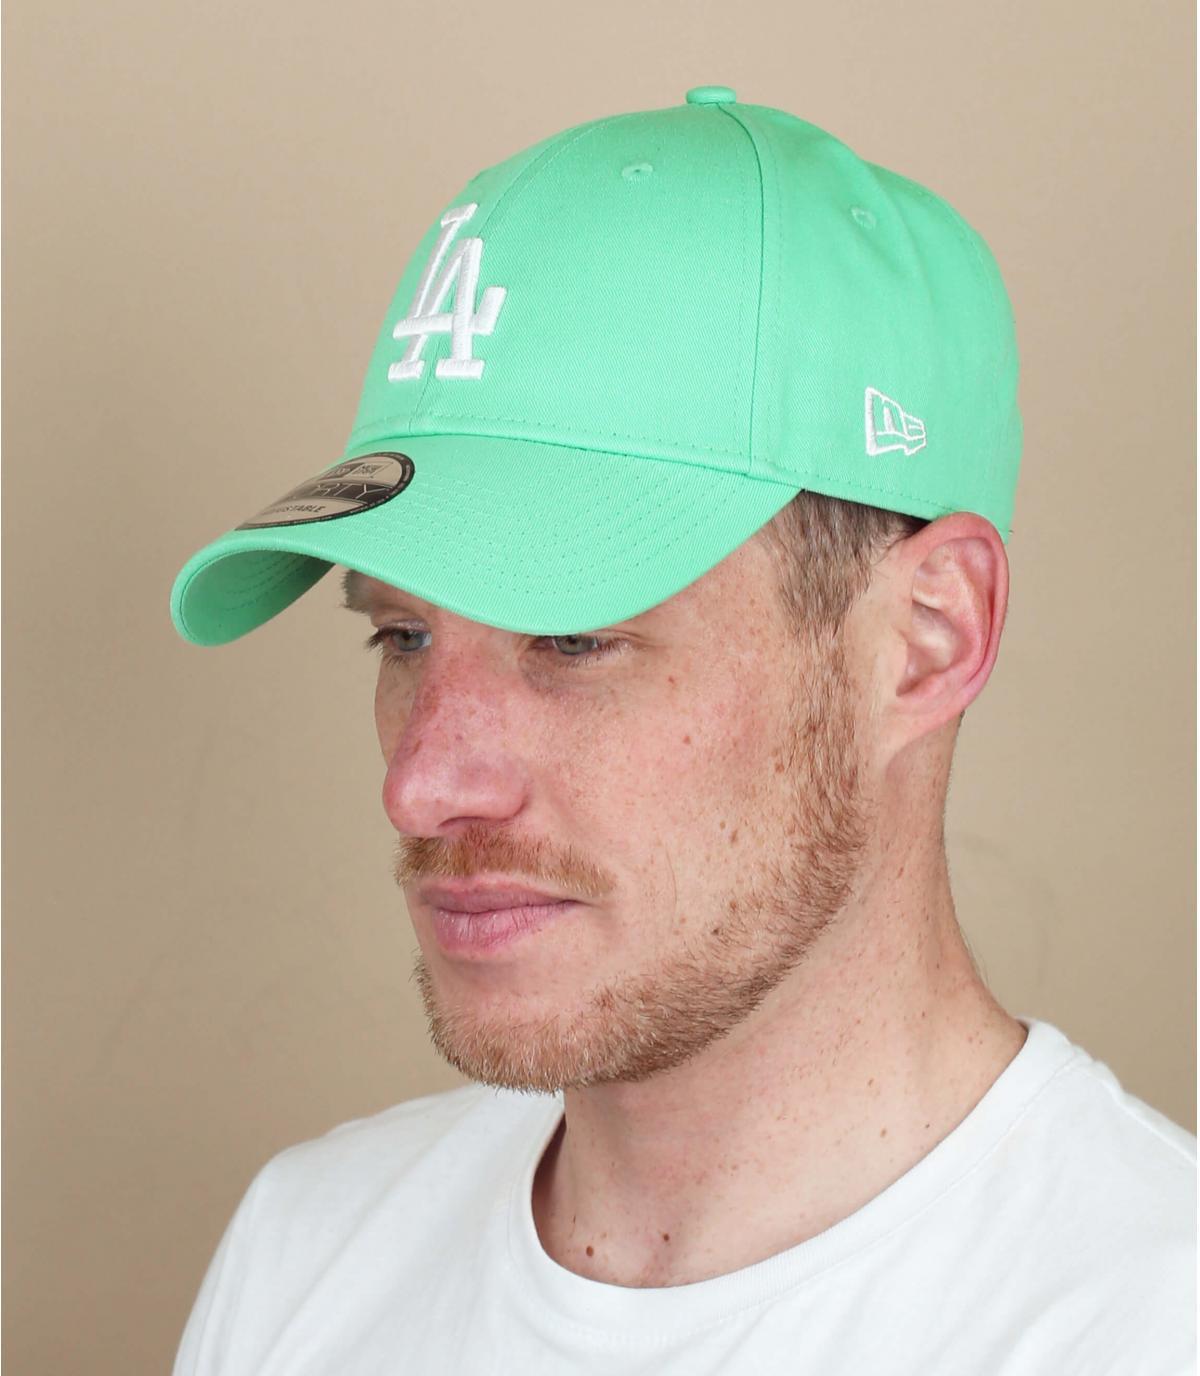 Cappellino LA blu verde